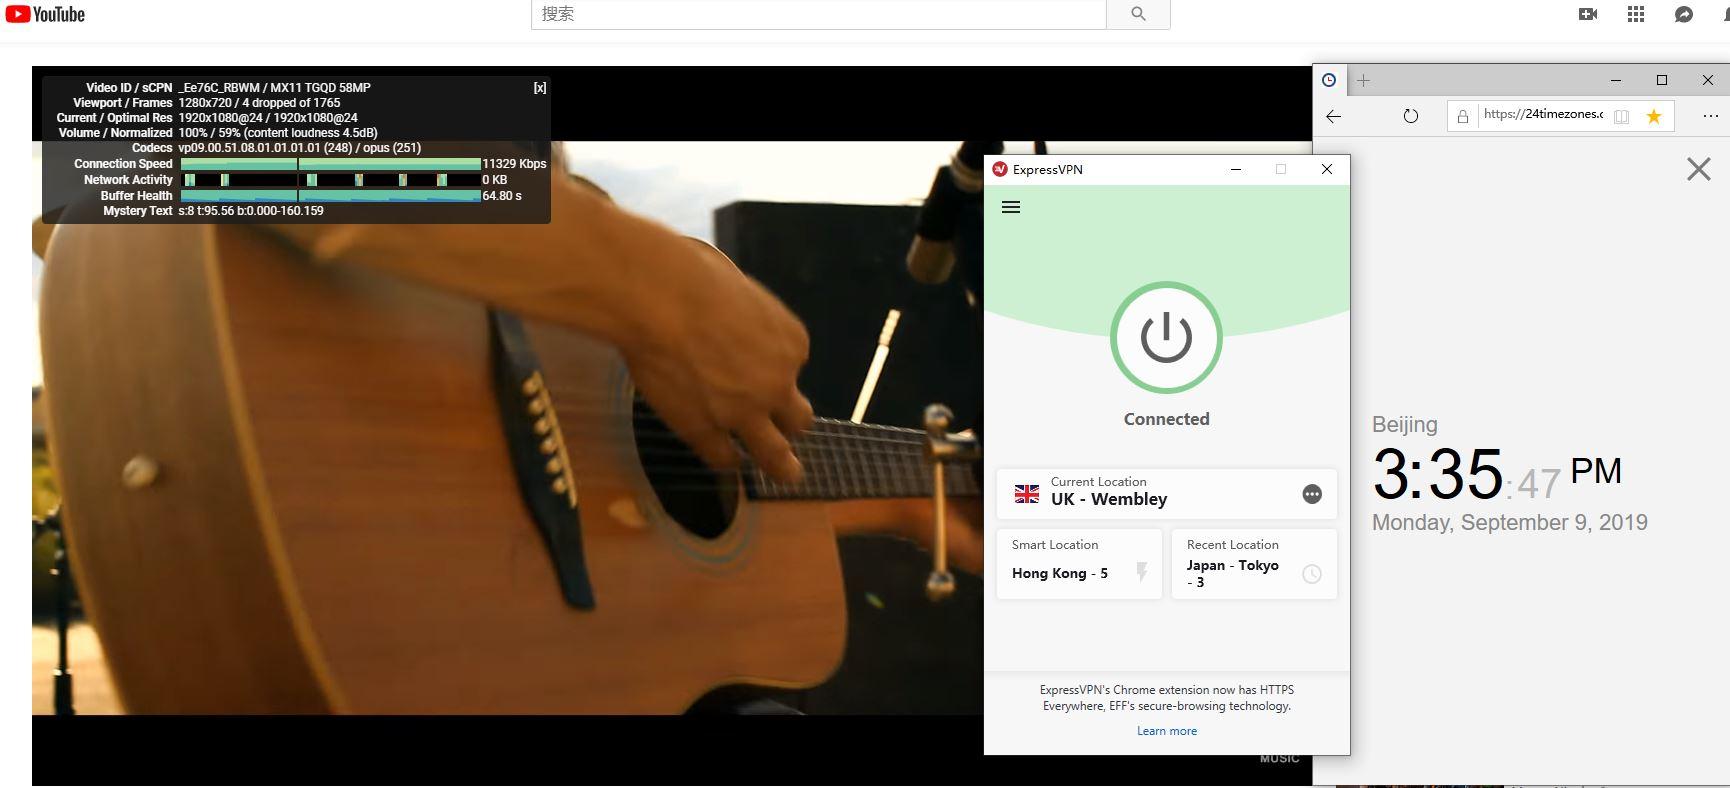 windows ExpressVPN UK-wemble 服务器 中国VPN翻墙 科学上网 YouTube速度测试-20190909